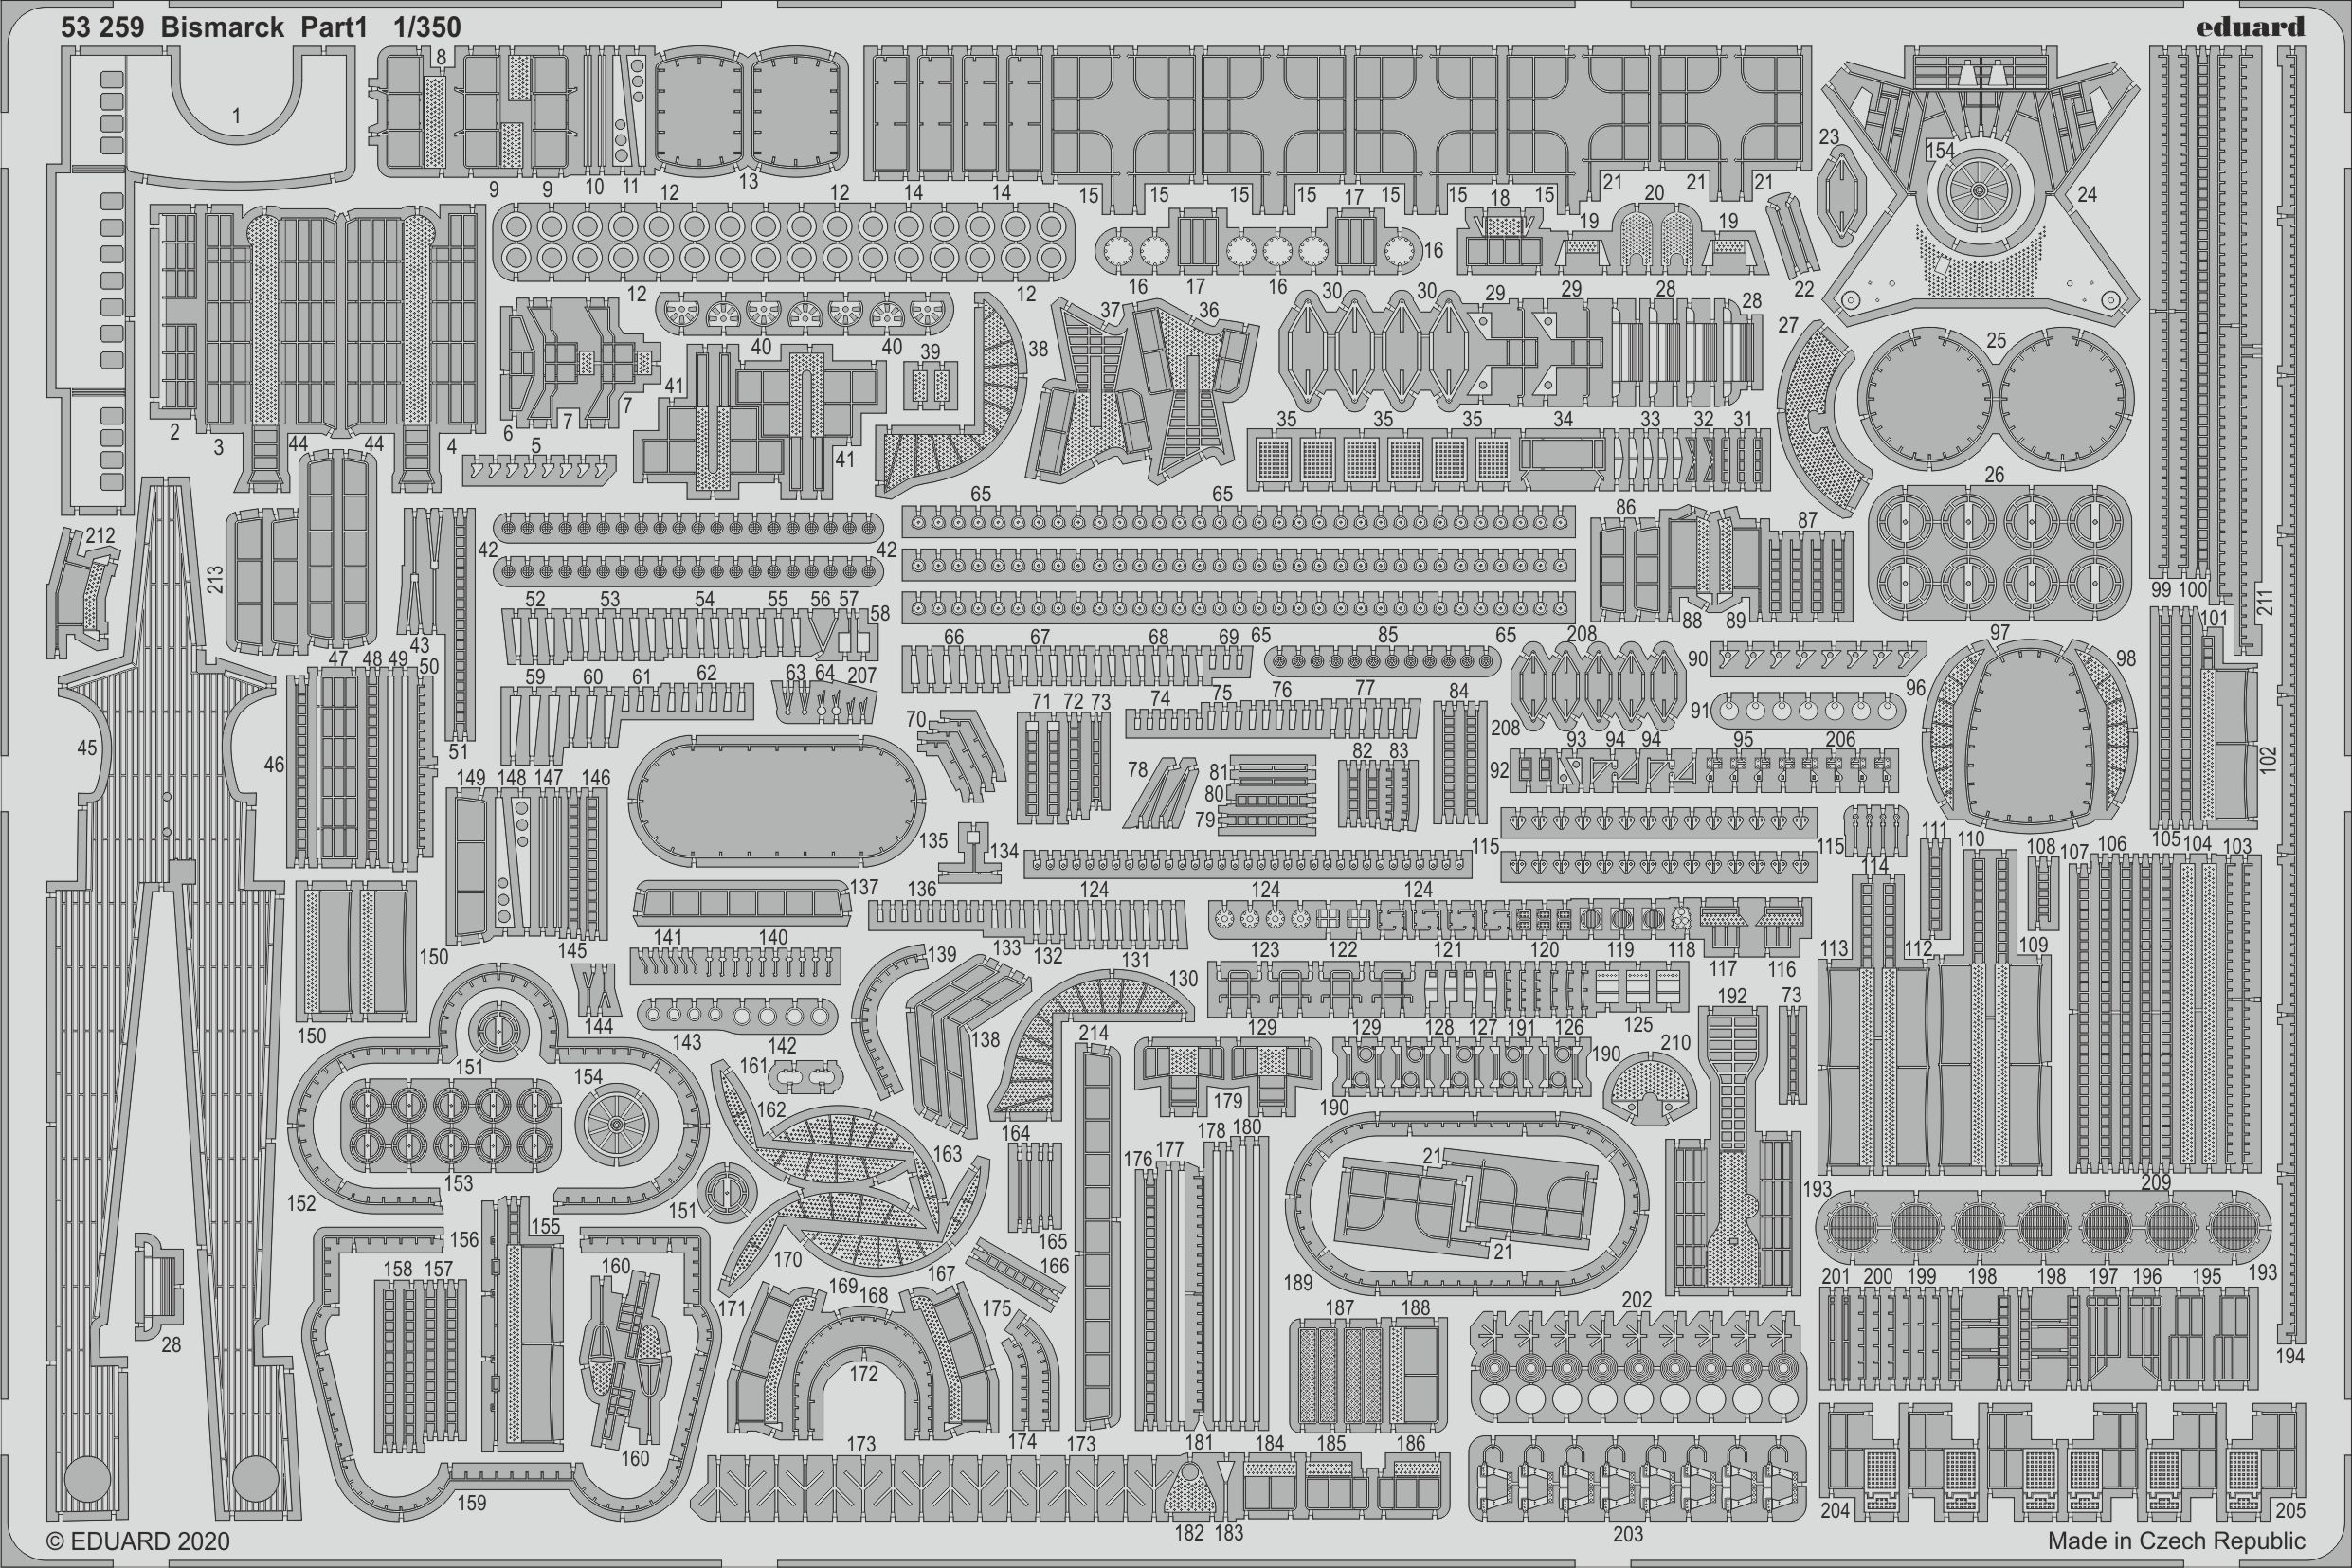 ED53259